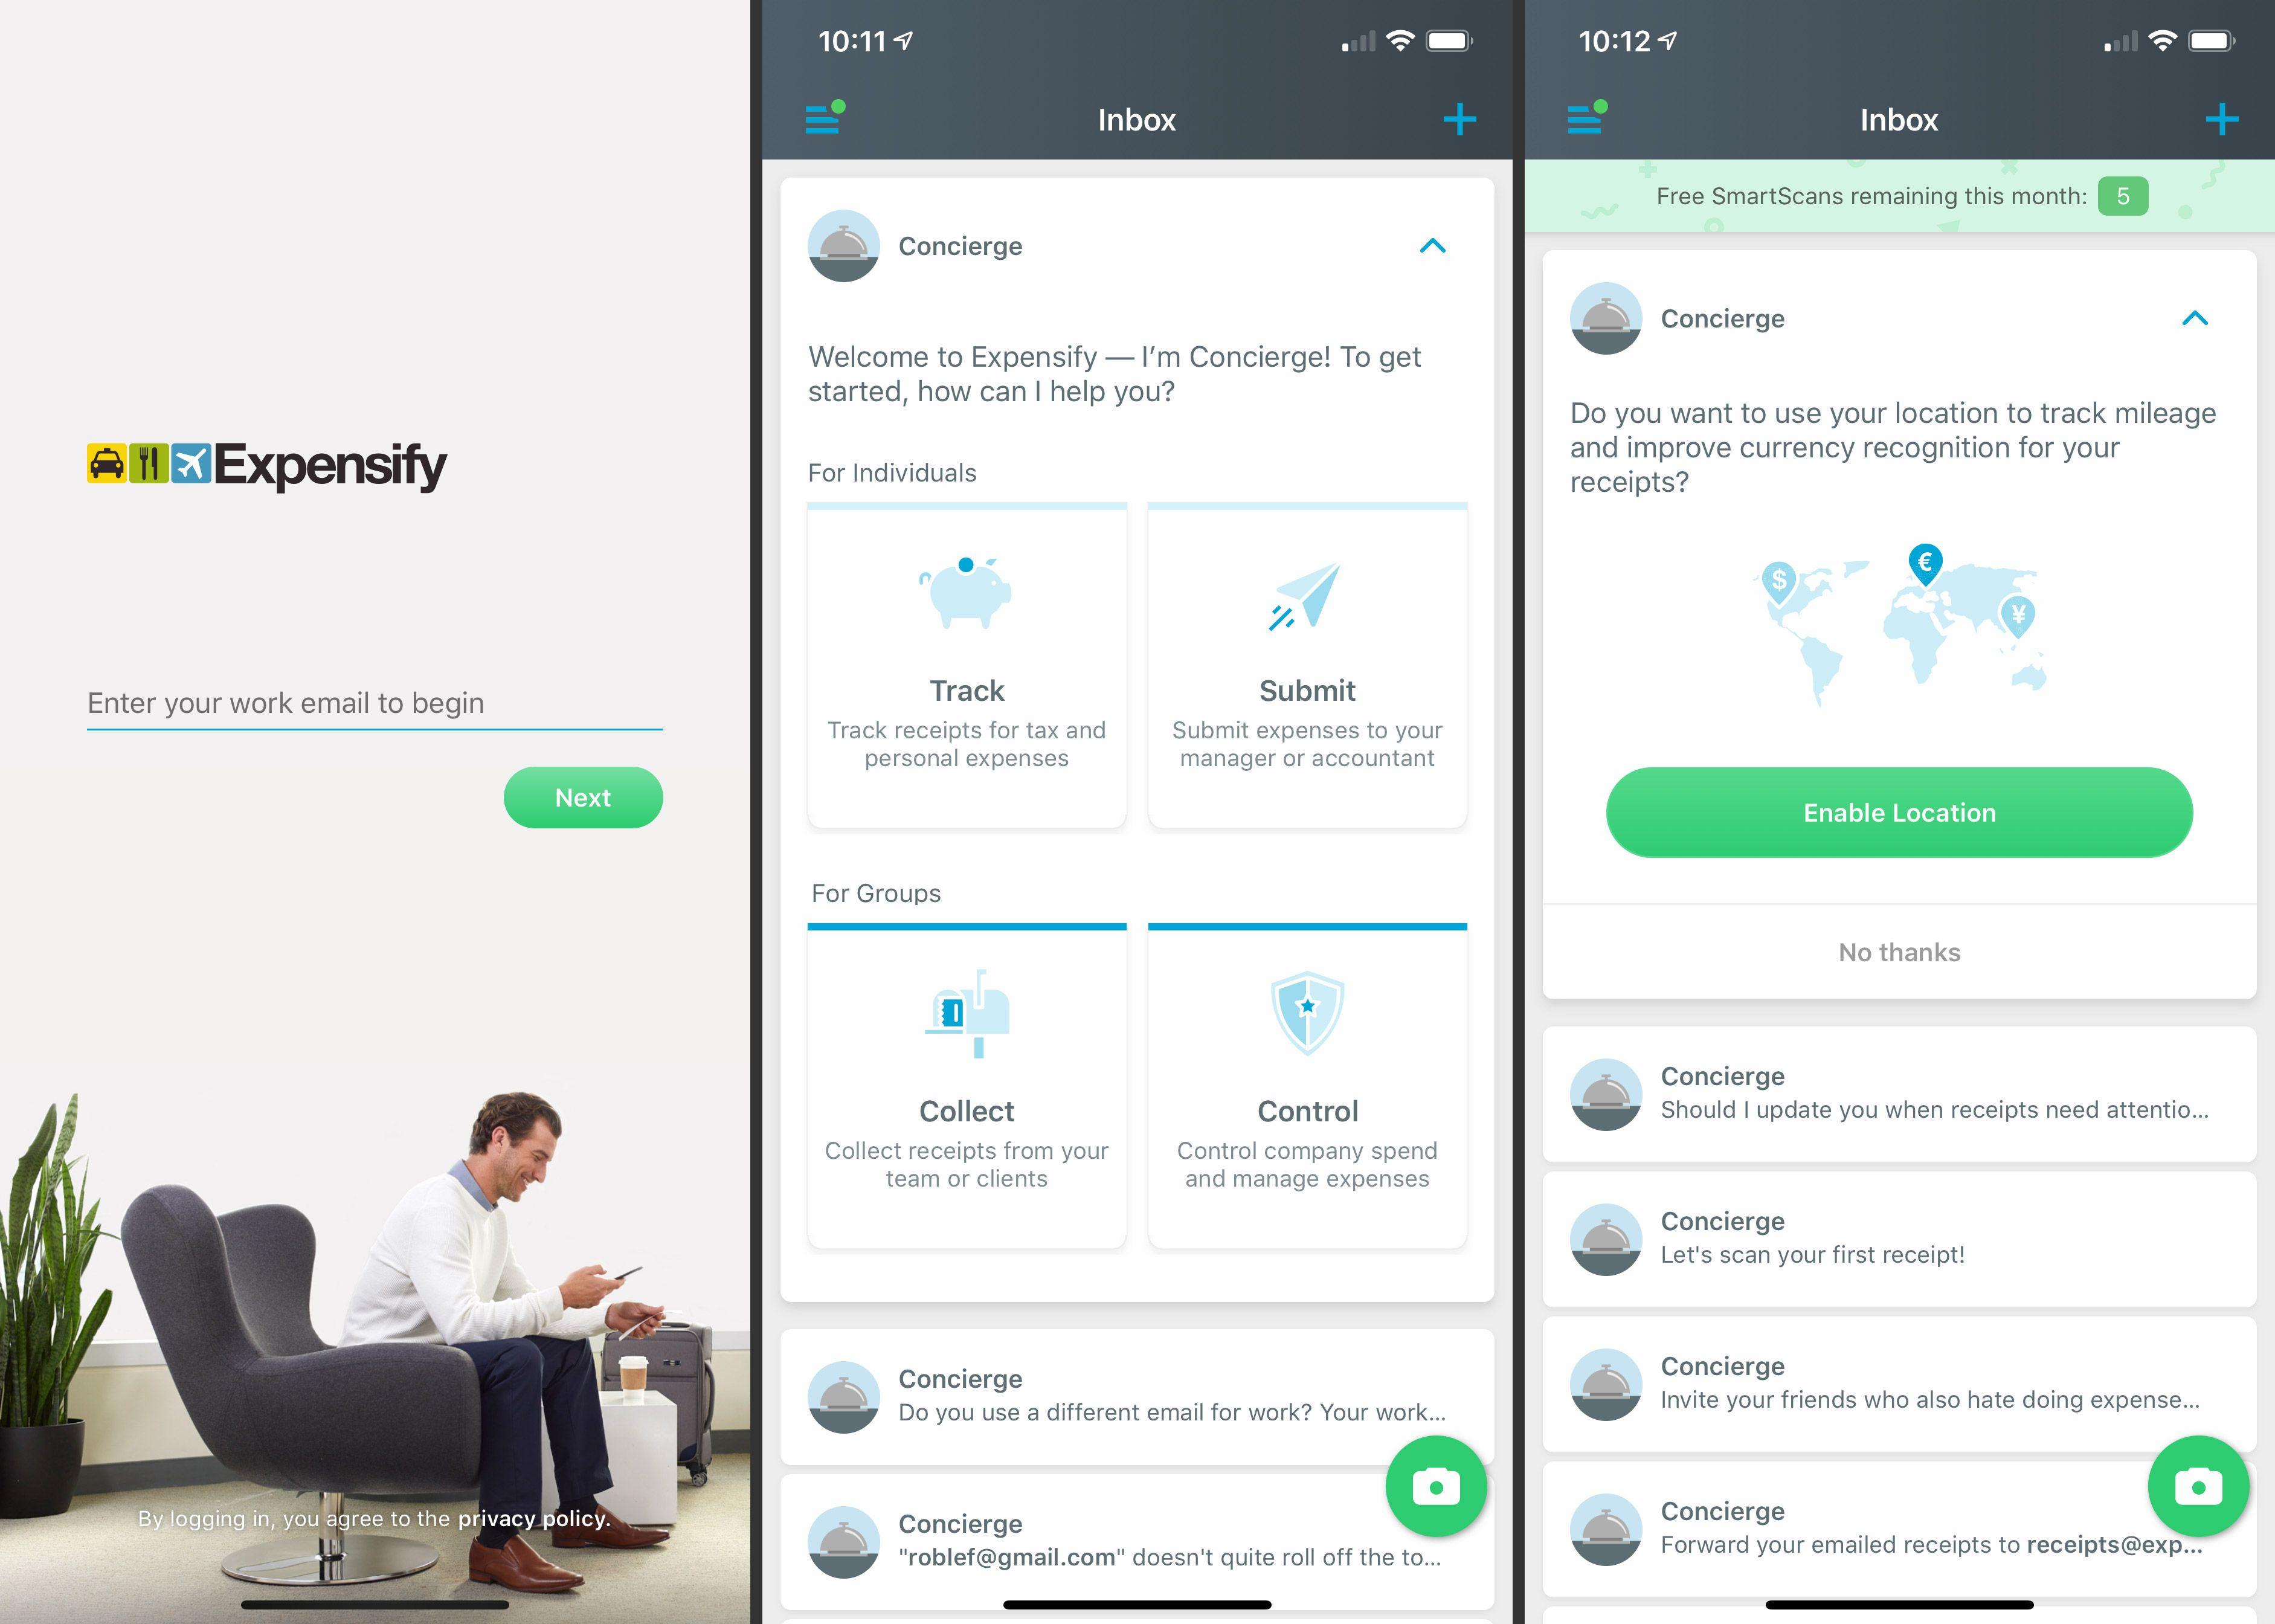 Three iOS Expensify app screens